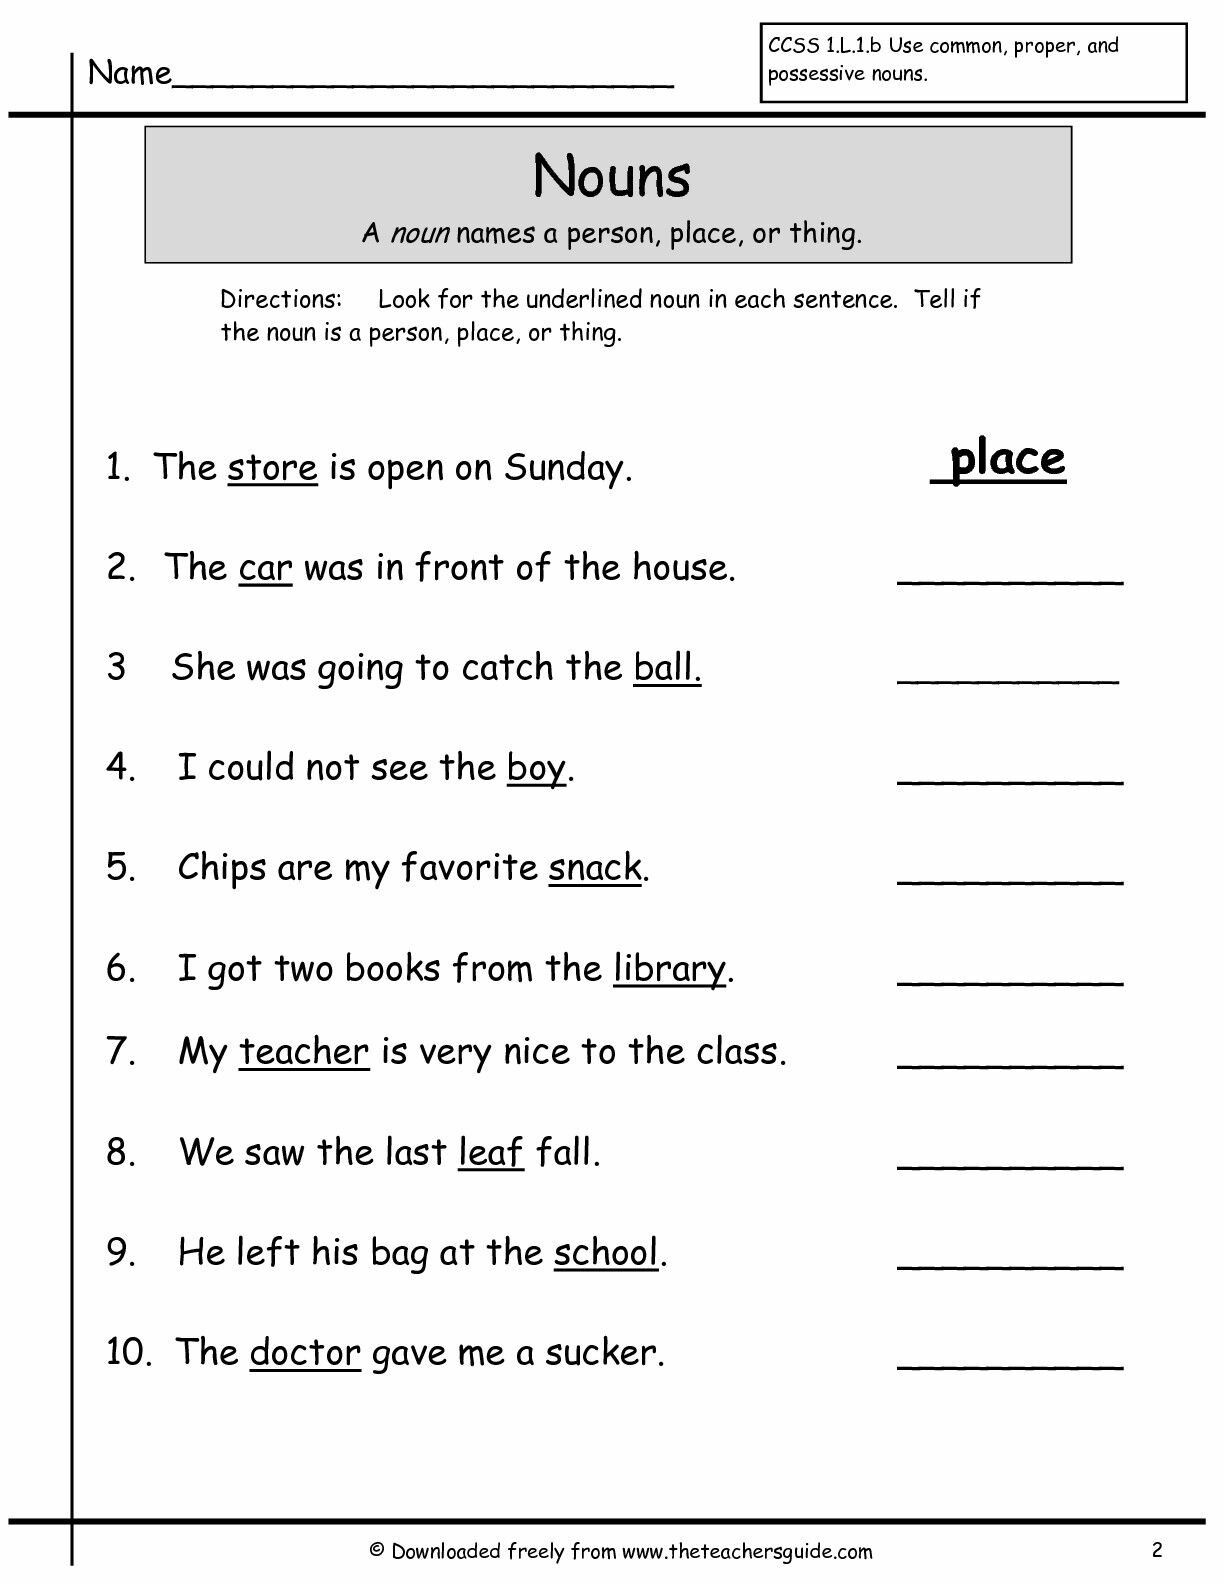 medium resolution of Pin by jazmin on Classwork   Nouns worksheet